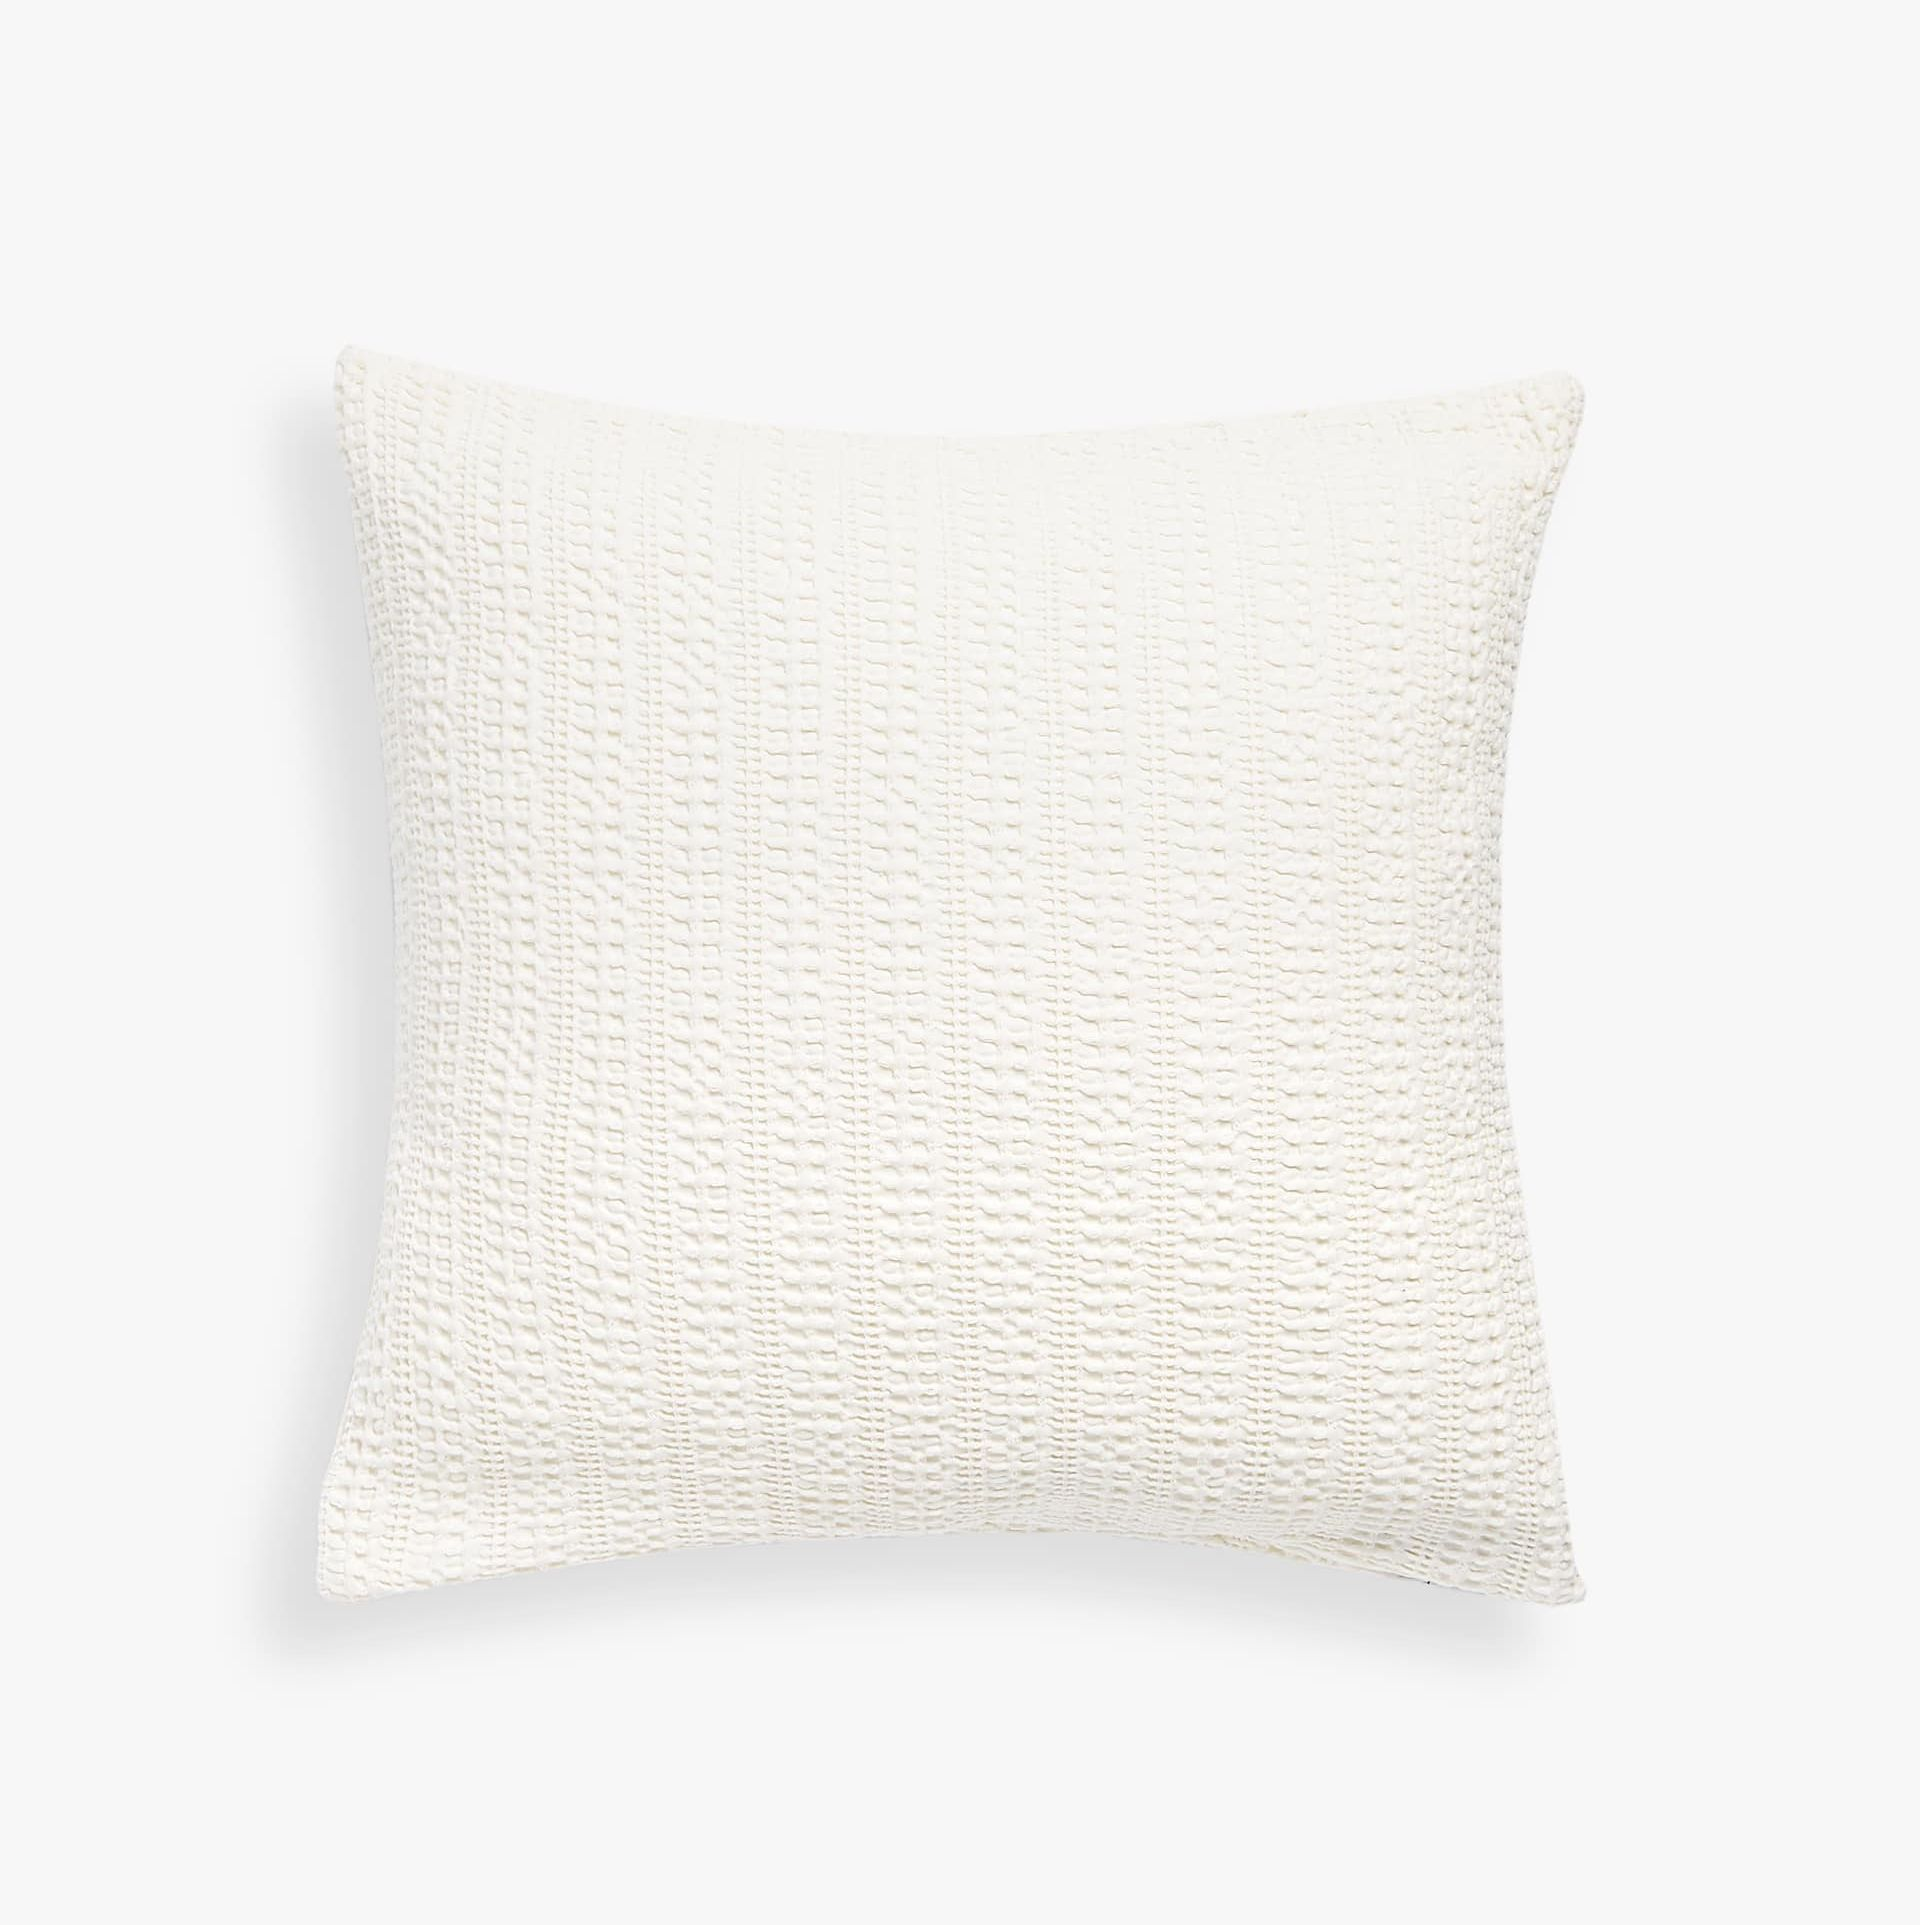 Cojín de rayas de algodón blanco